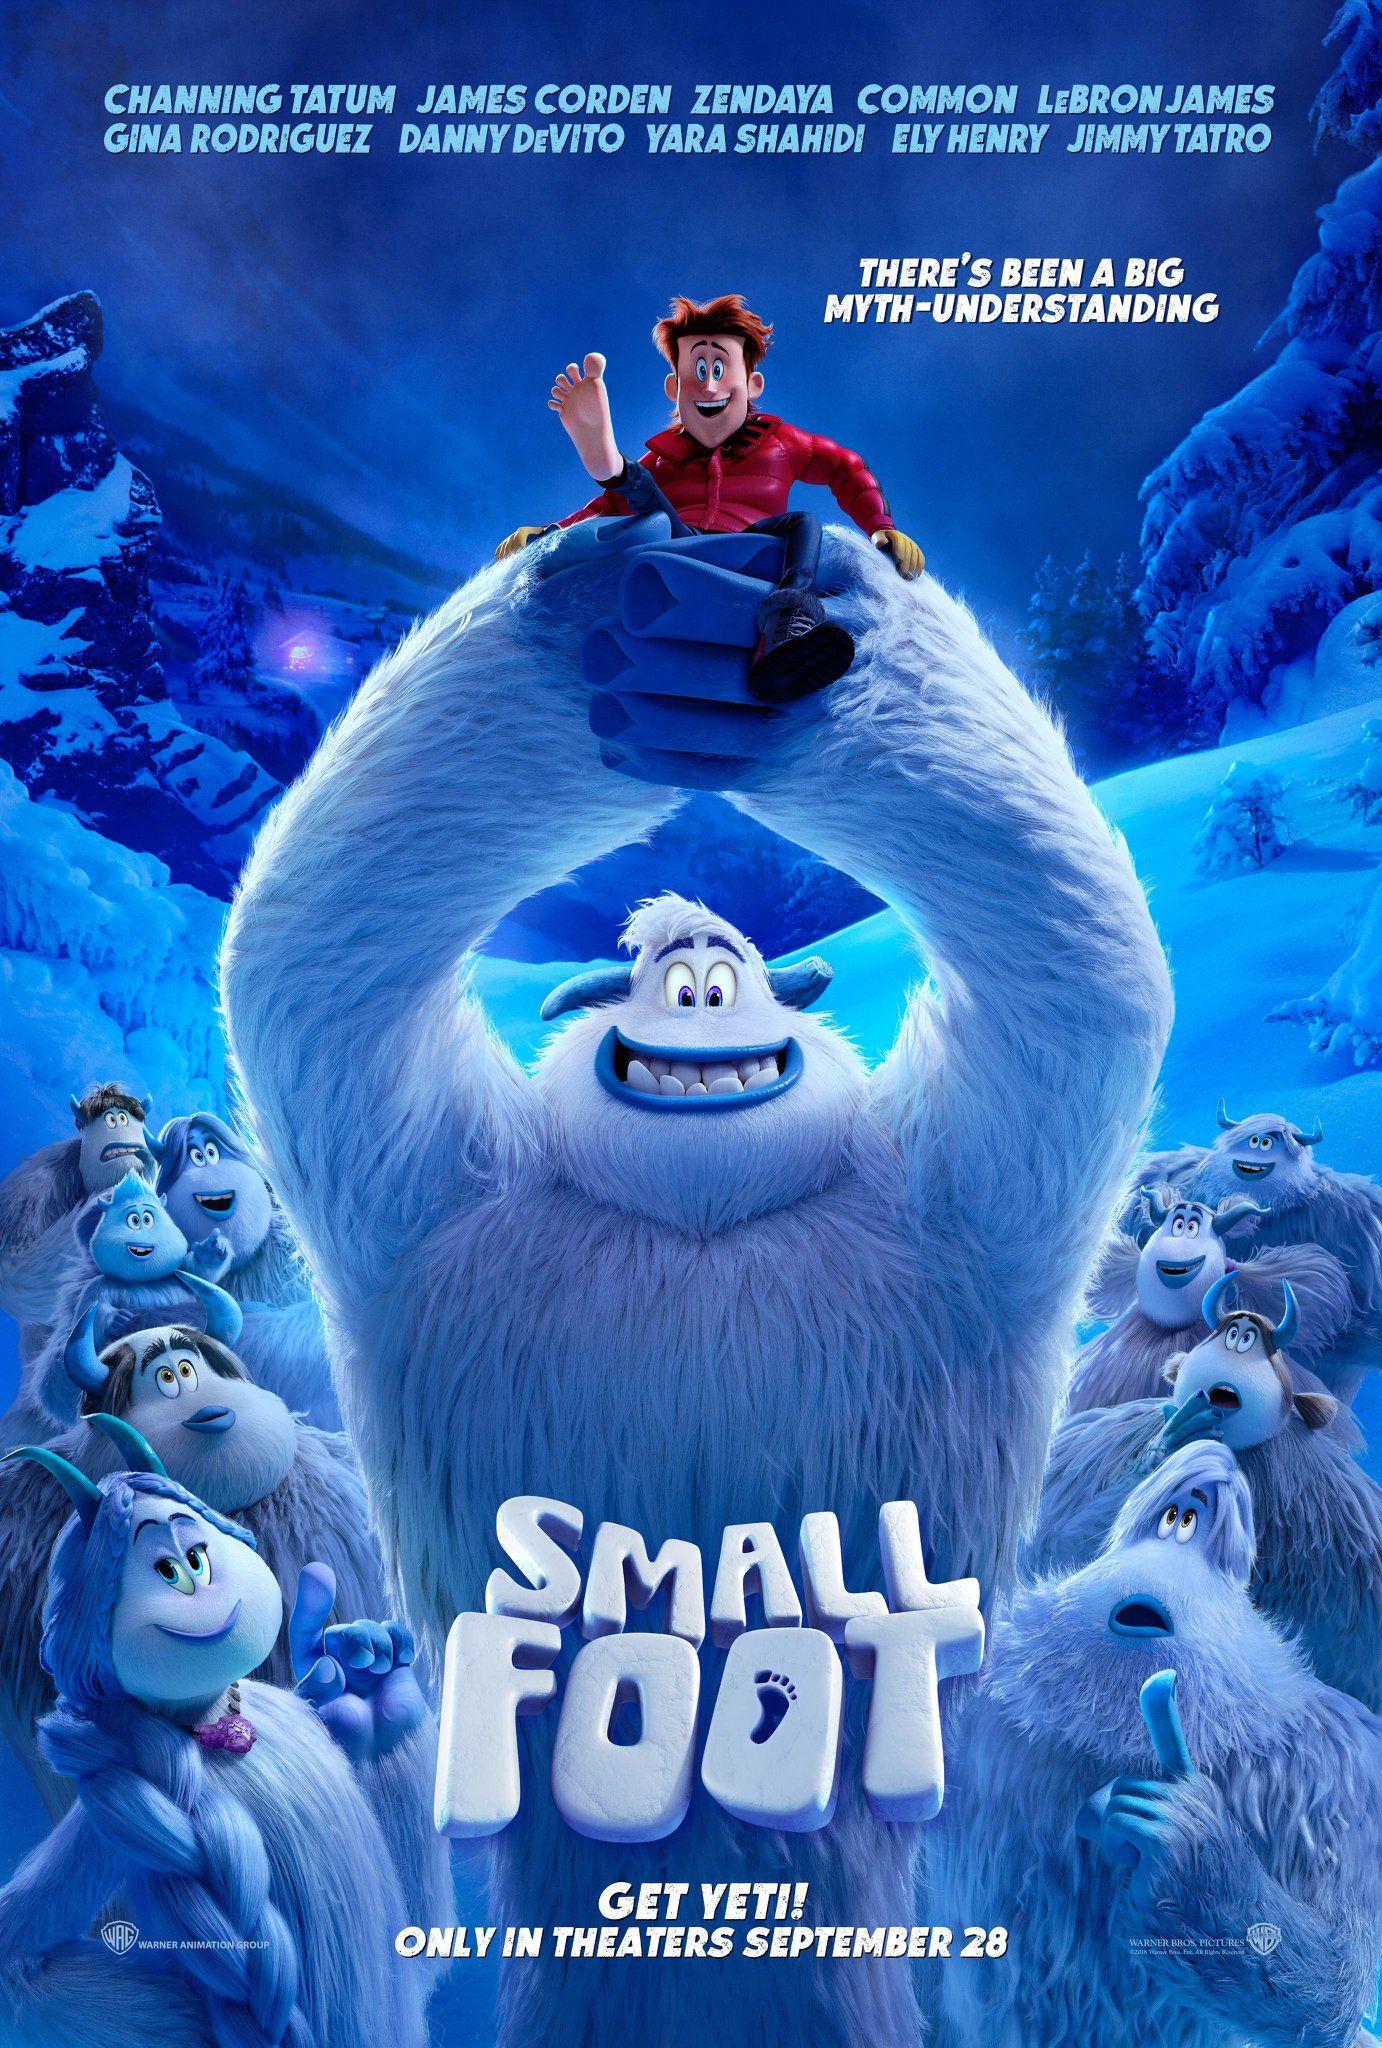 SMALLFOOT In theaters September 28, 2018 Ver películas